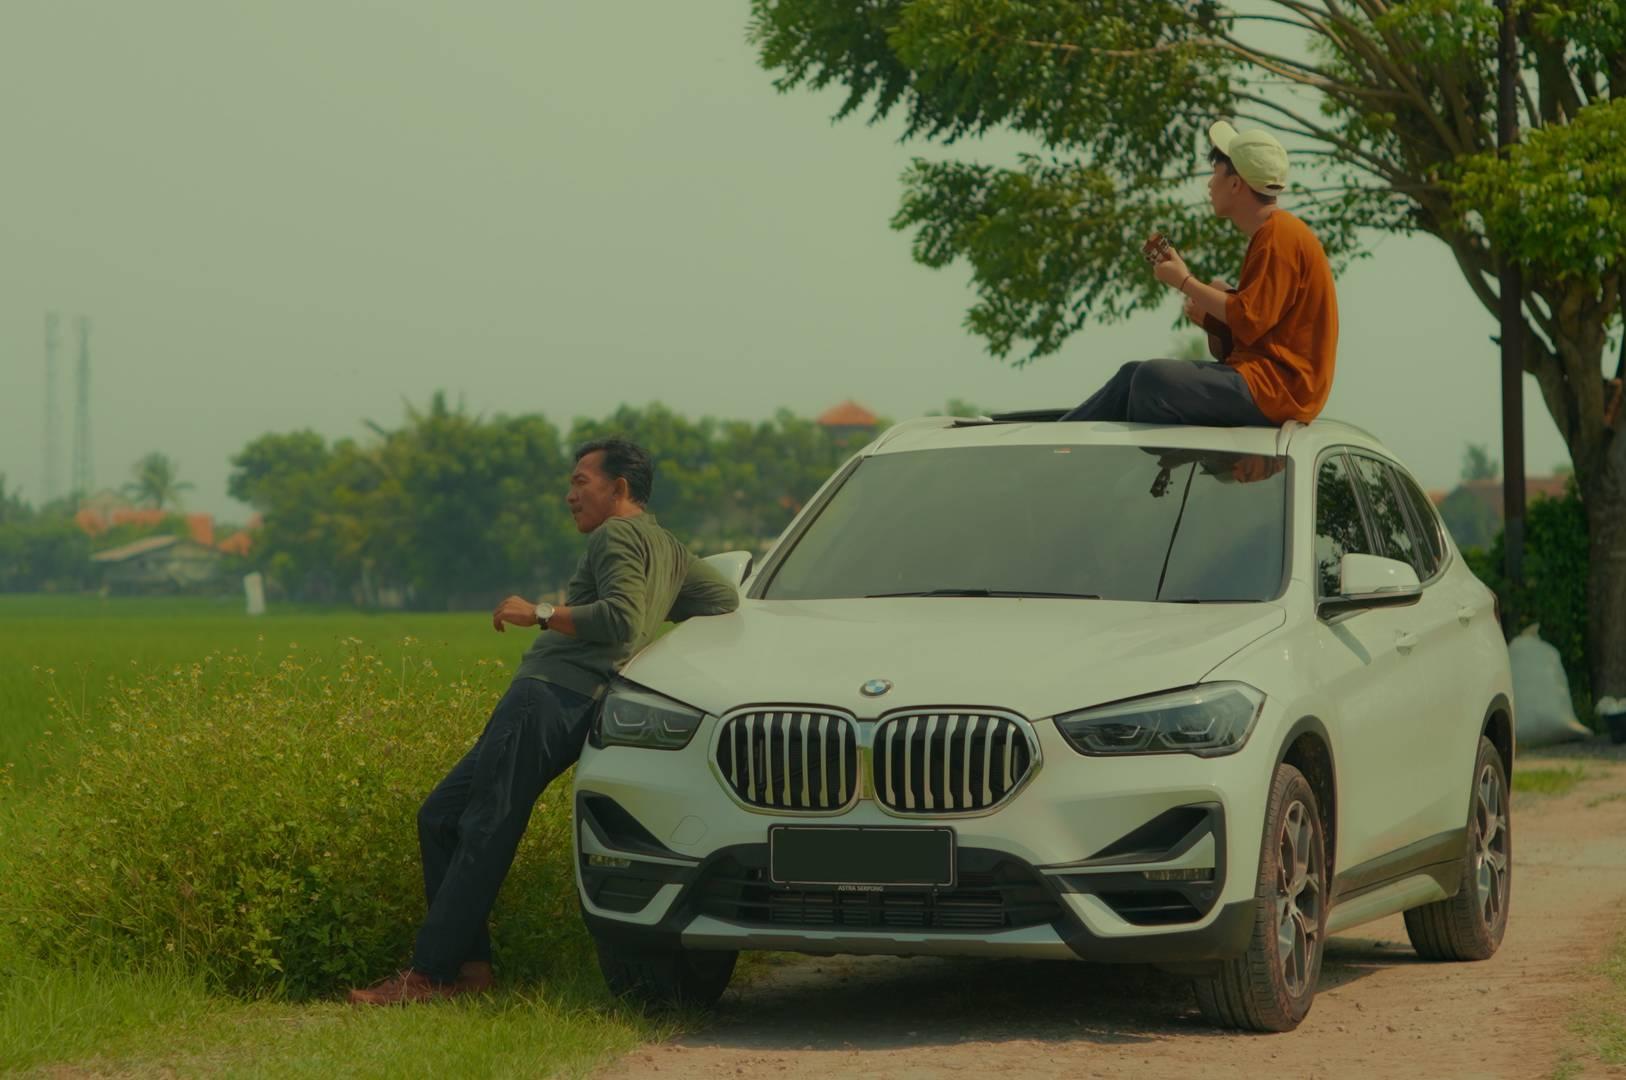 Film Pendek Elipsis Dirilis, Penggemar BMW Wajib Nonton